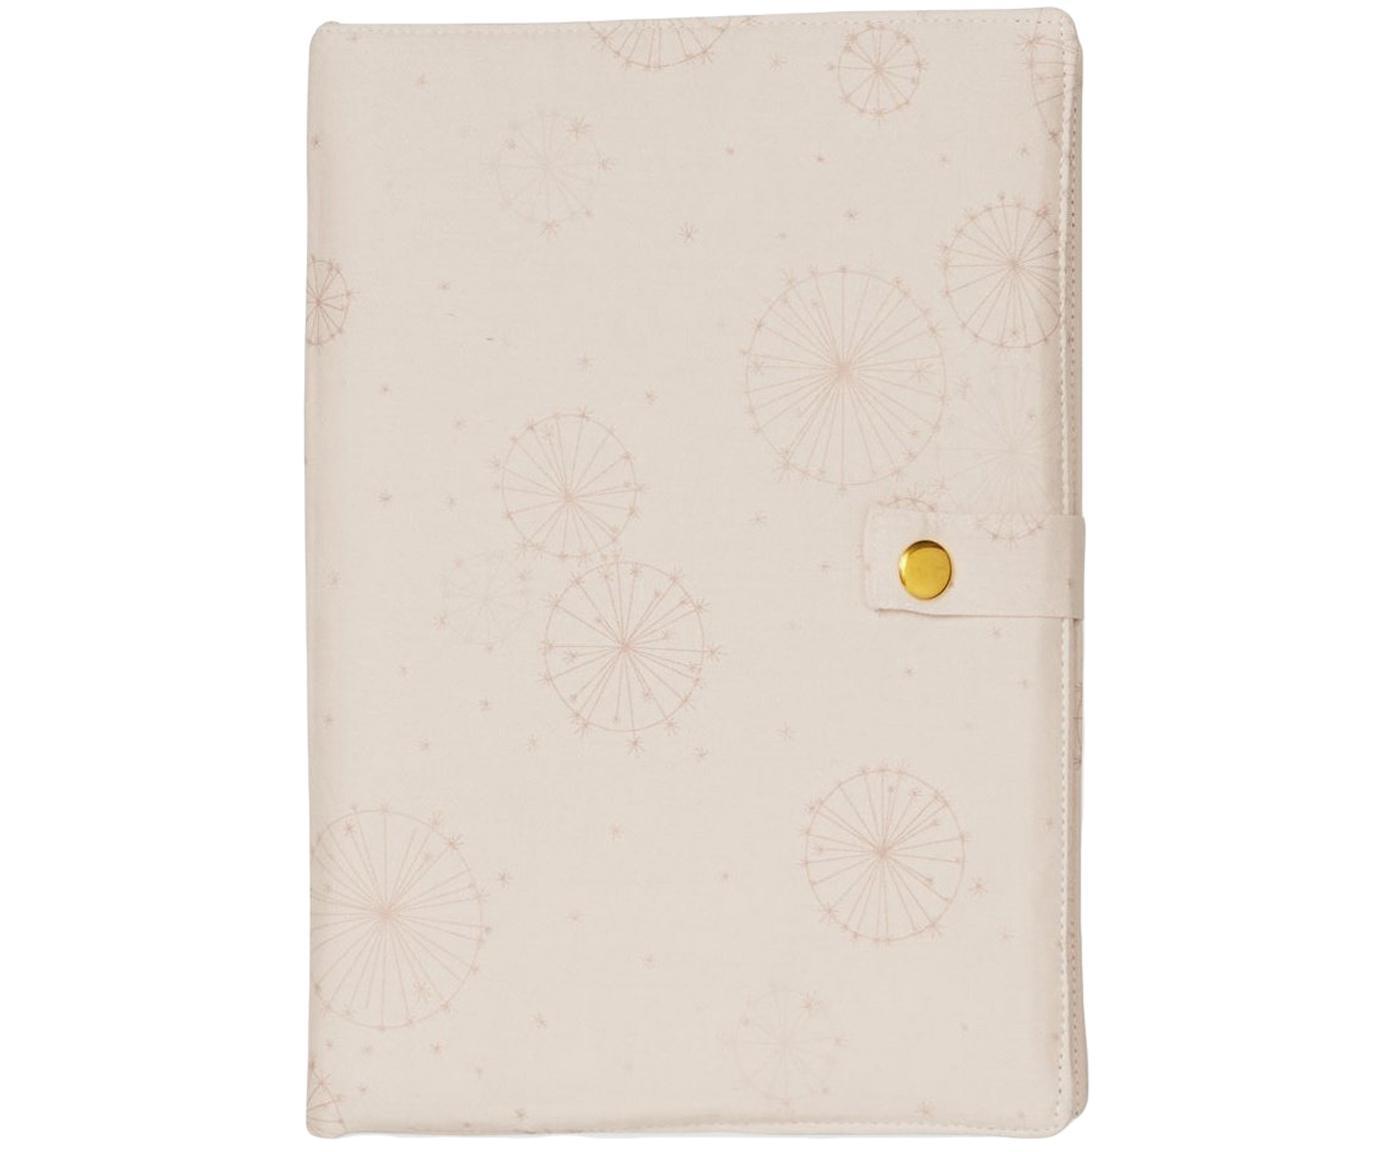 Copertina in cotone per diario nascita Dandelion, Cotone organico, certificato OCS, Rosa, Larg. 17 x Alt. 24 cm